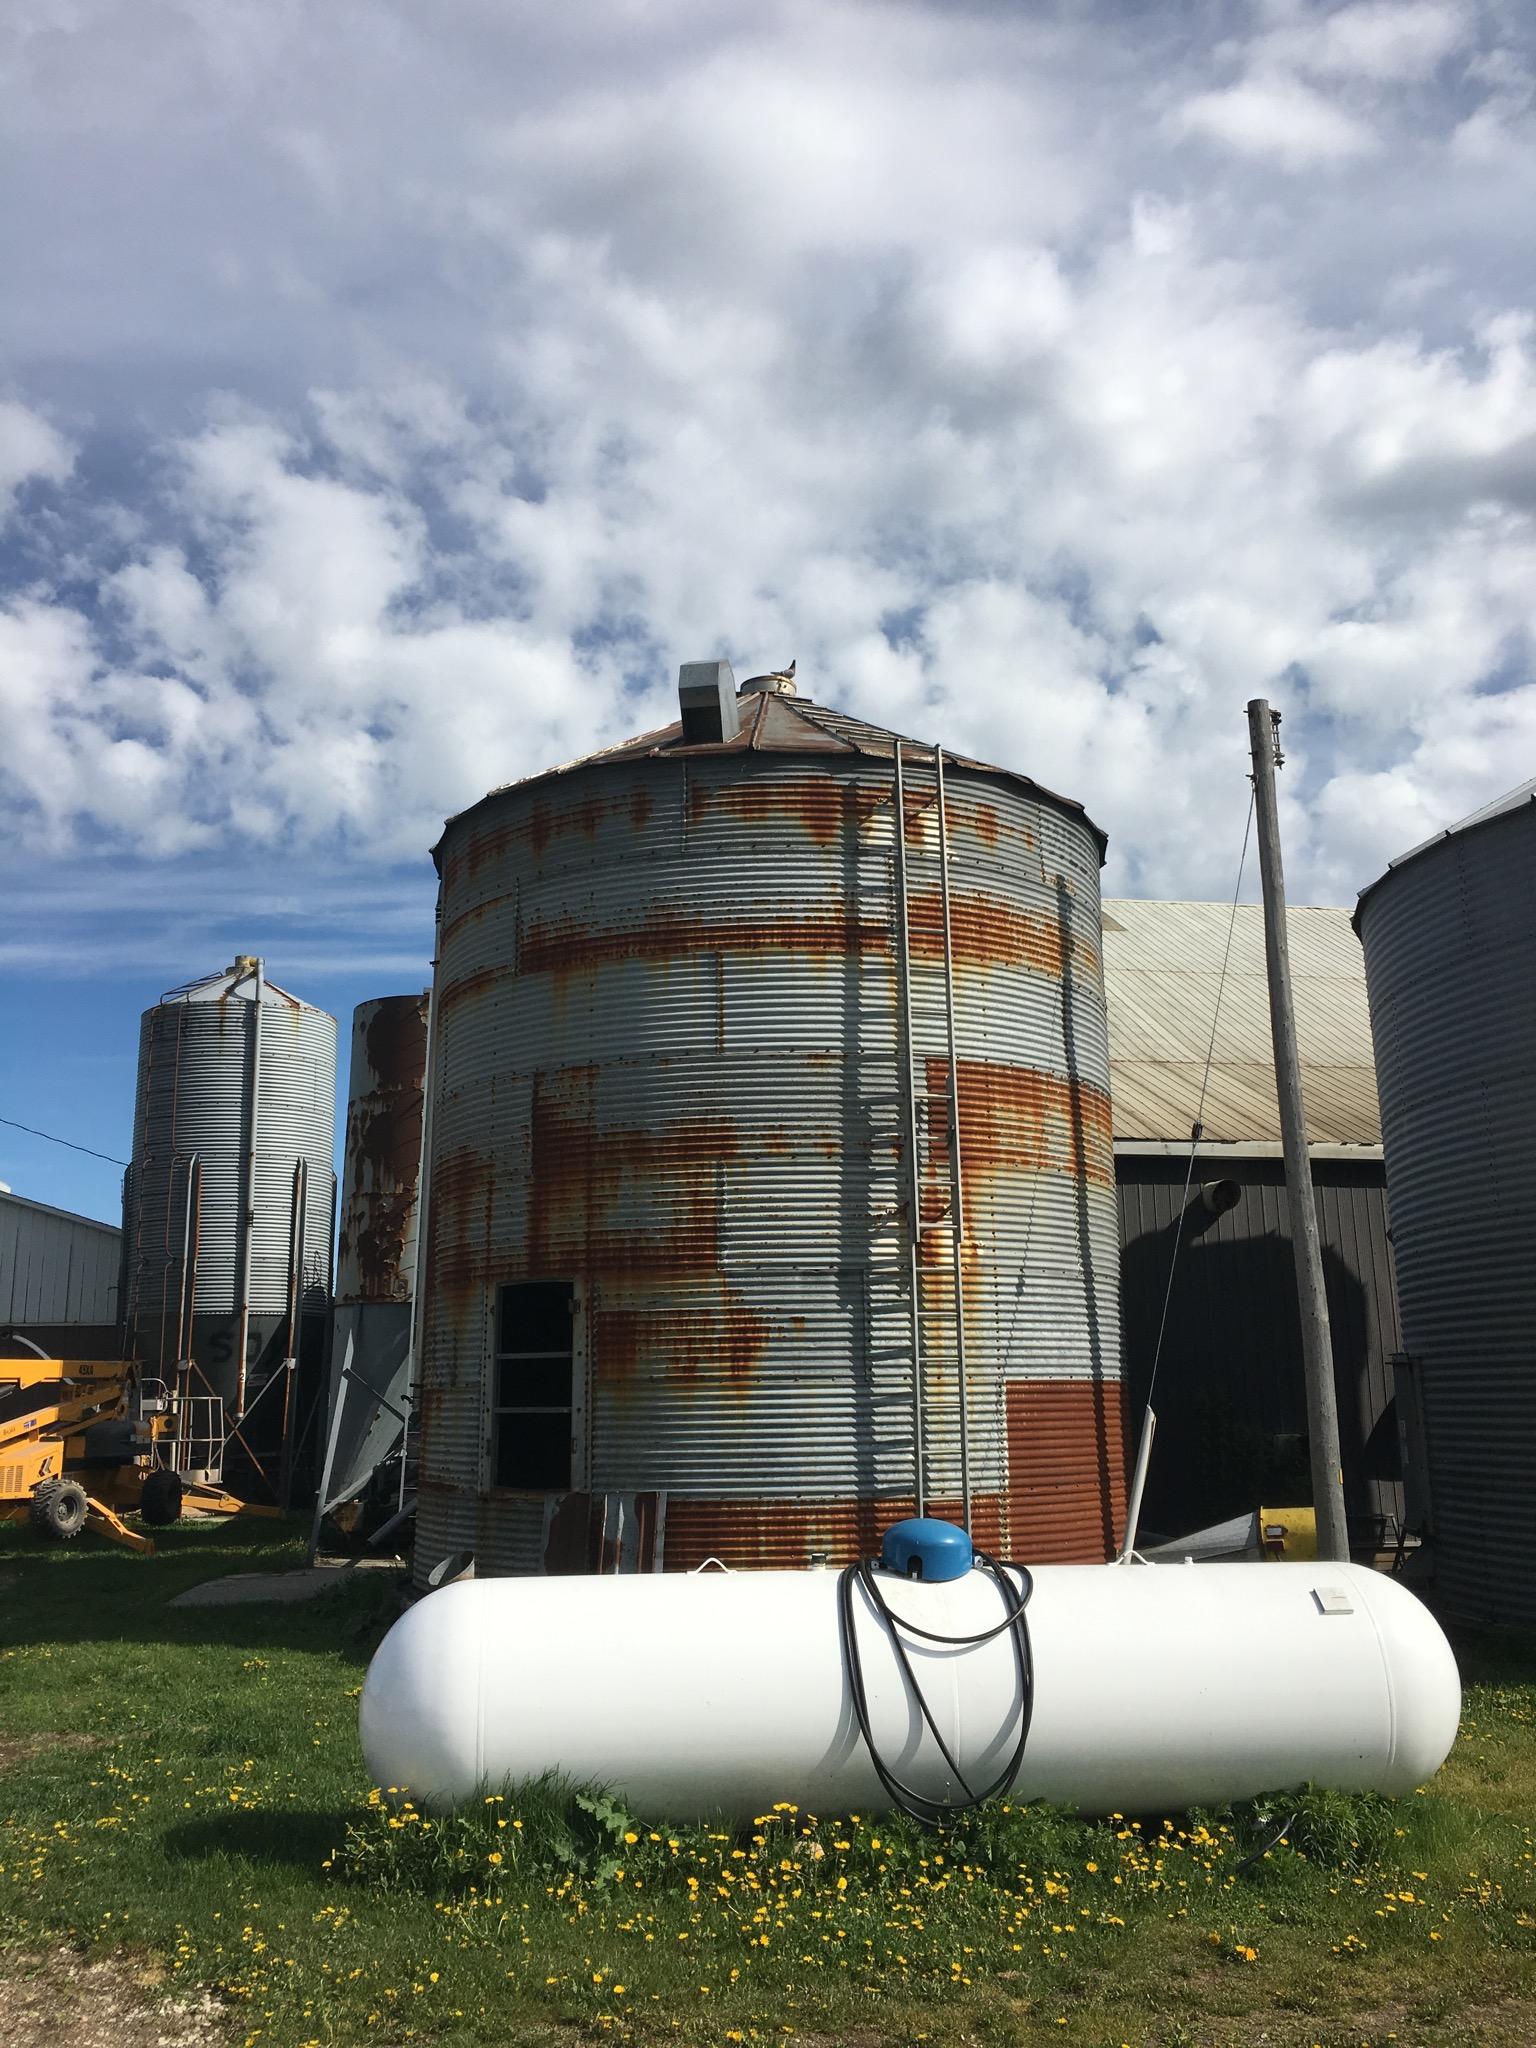 silo painting ontario canada - beforejpg